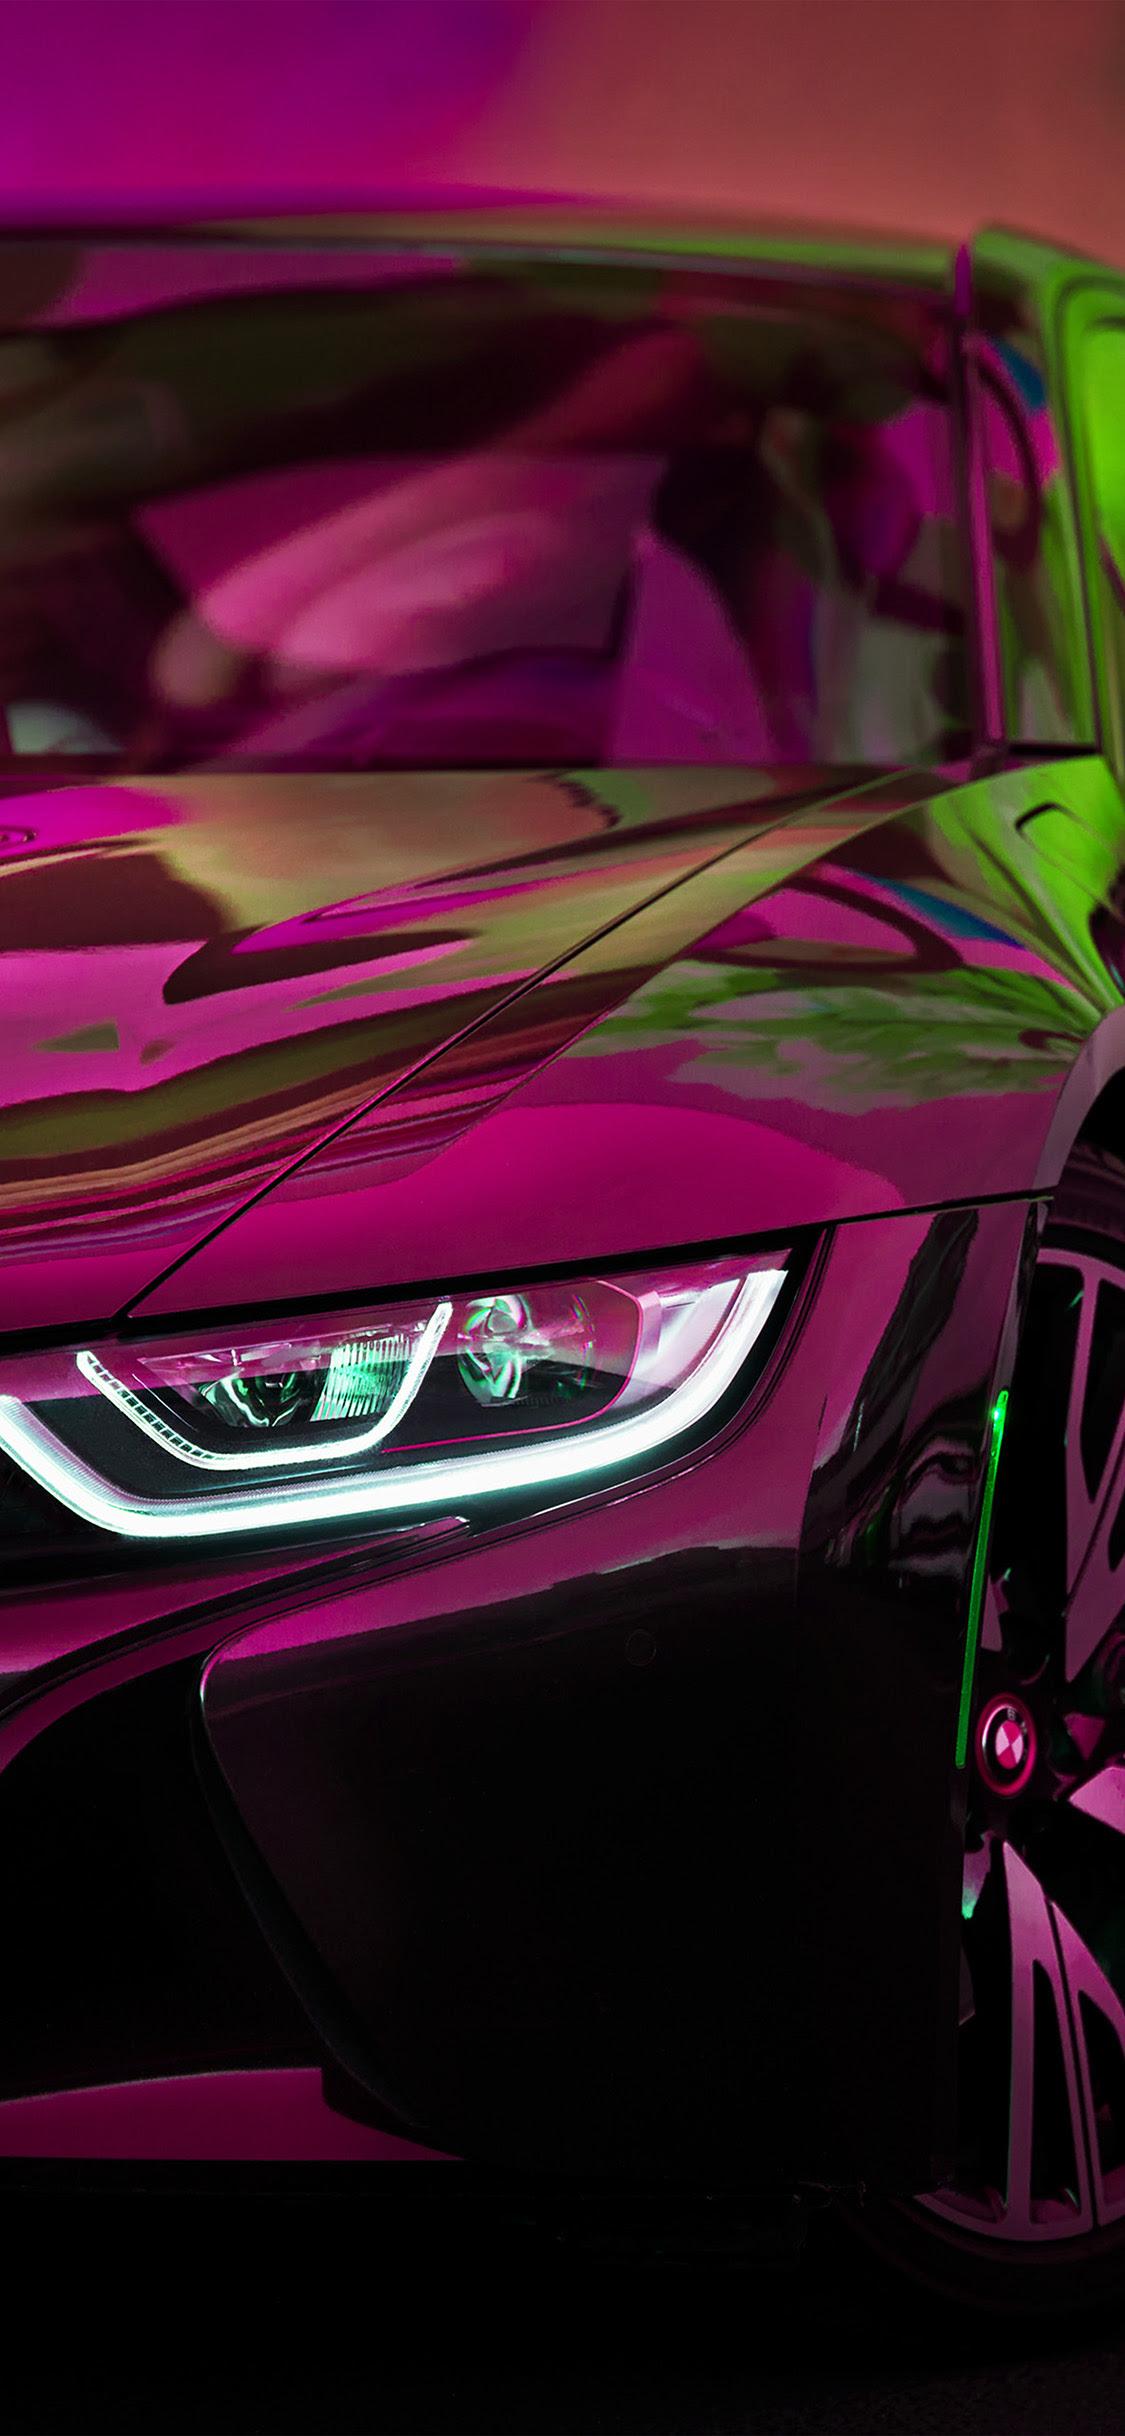 Iphonexpapers Com Iphone X Wallpaper Bf27 Bmw Rainbow Red Purple Car Art